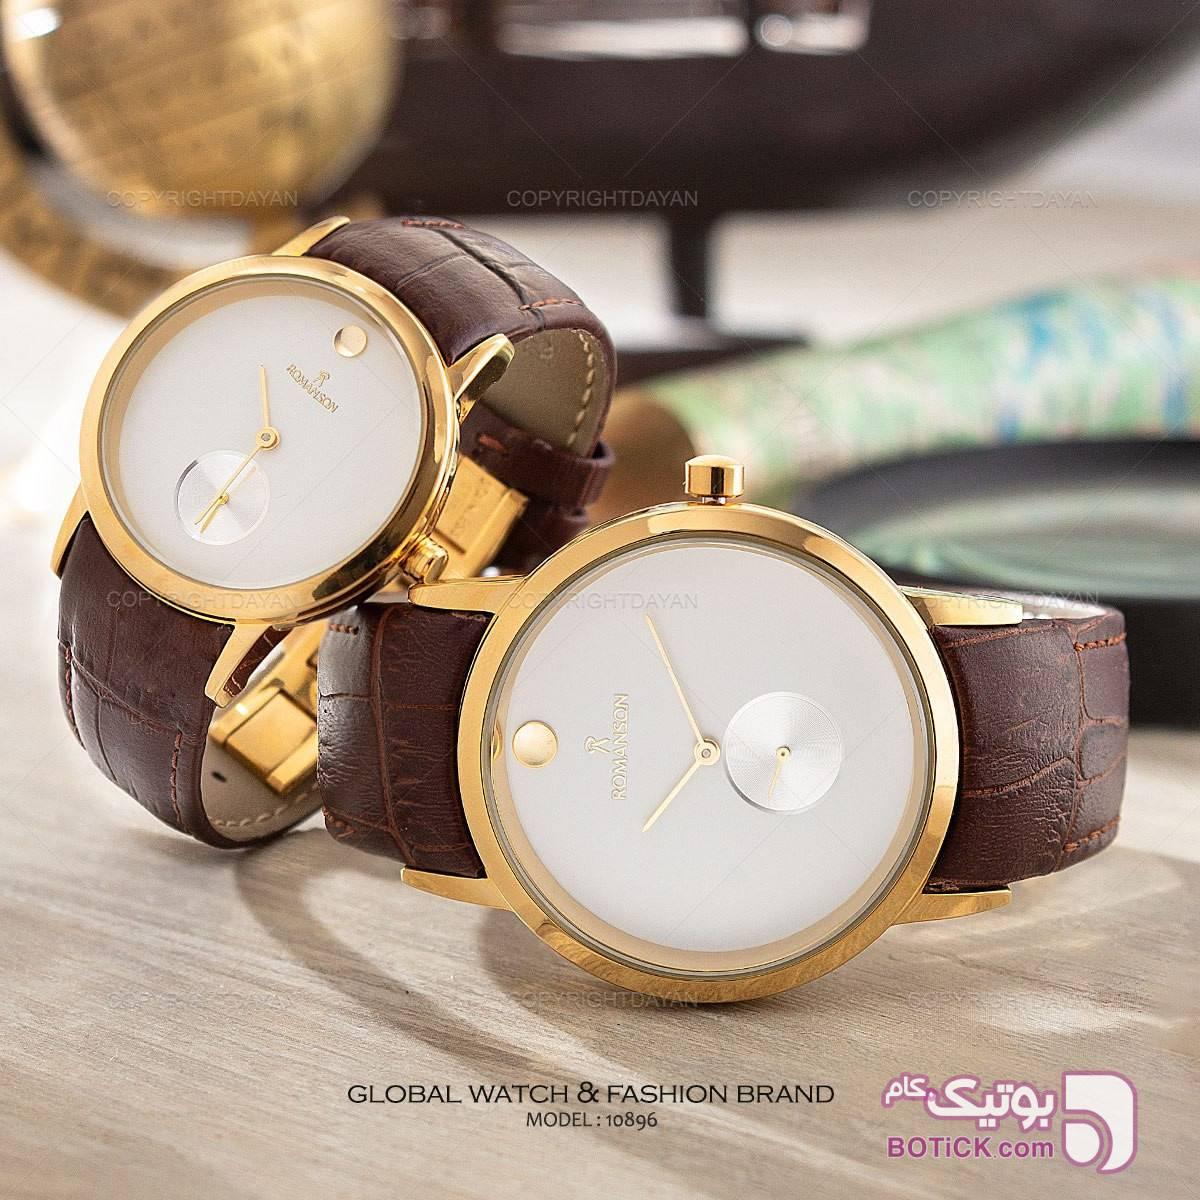 ست ساعت مردانه و زنانه رومانسون زرد ساعت